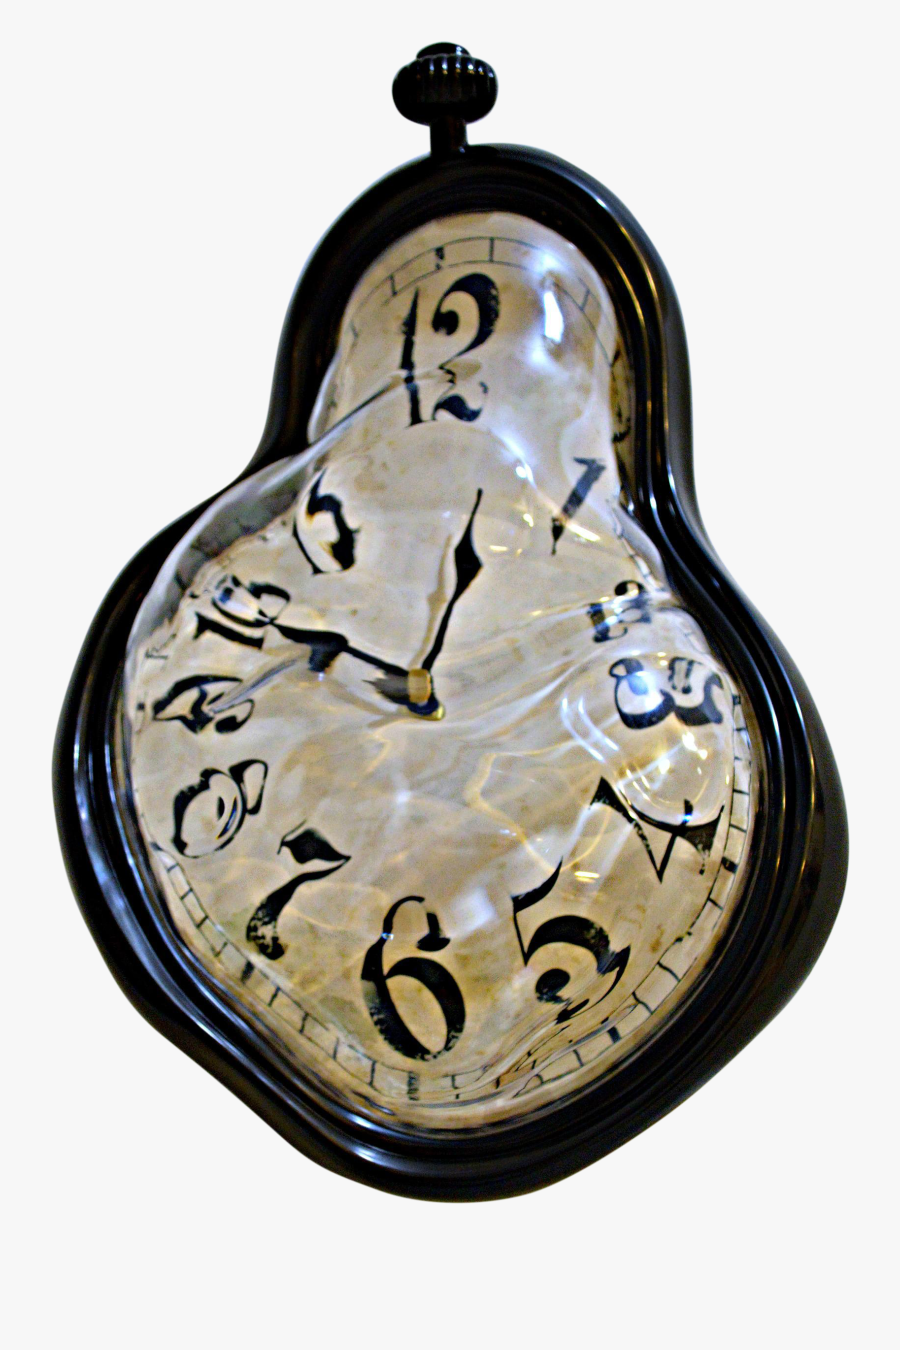 Transparent Melting Clock Clipart.